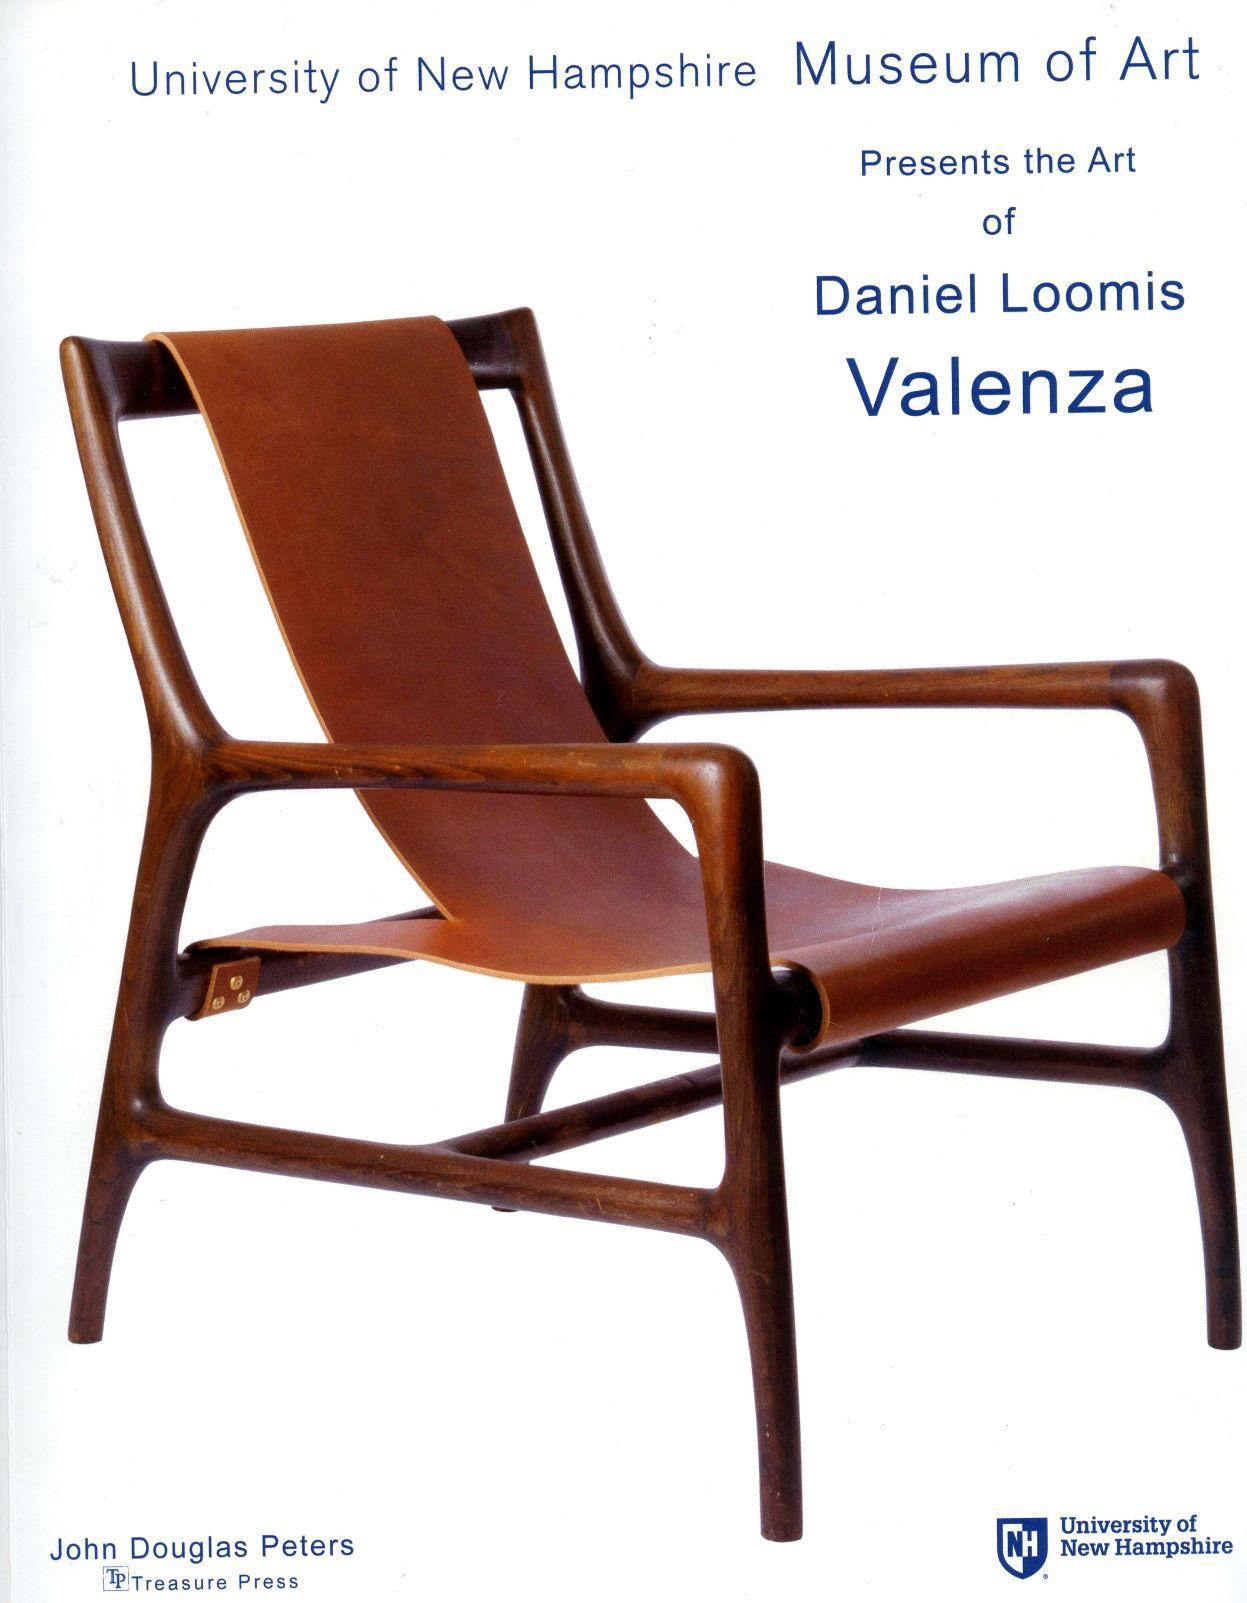 Daniel Loomis Valenza Catalogue